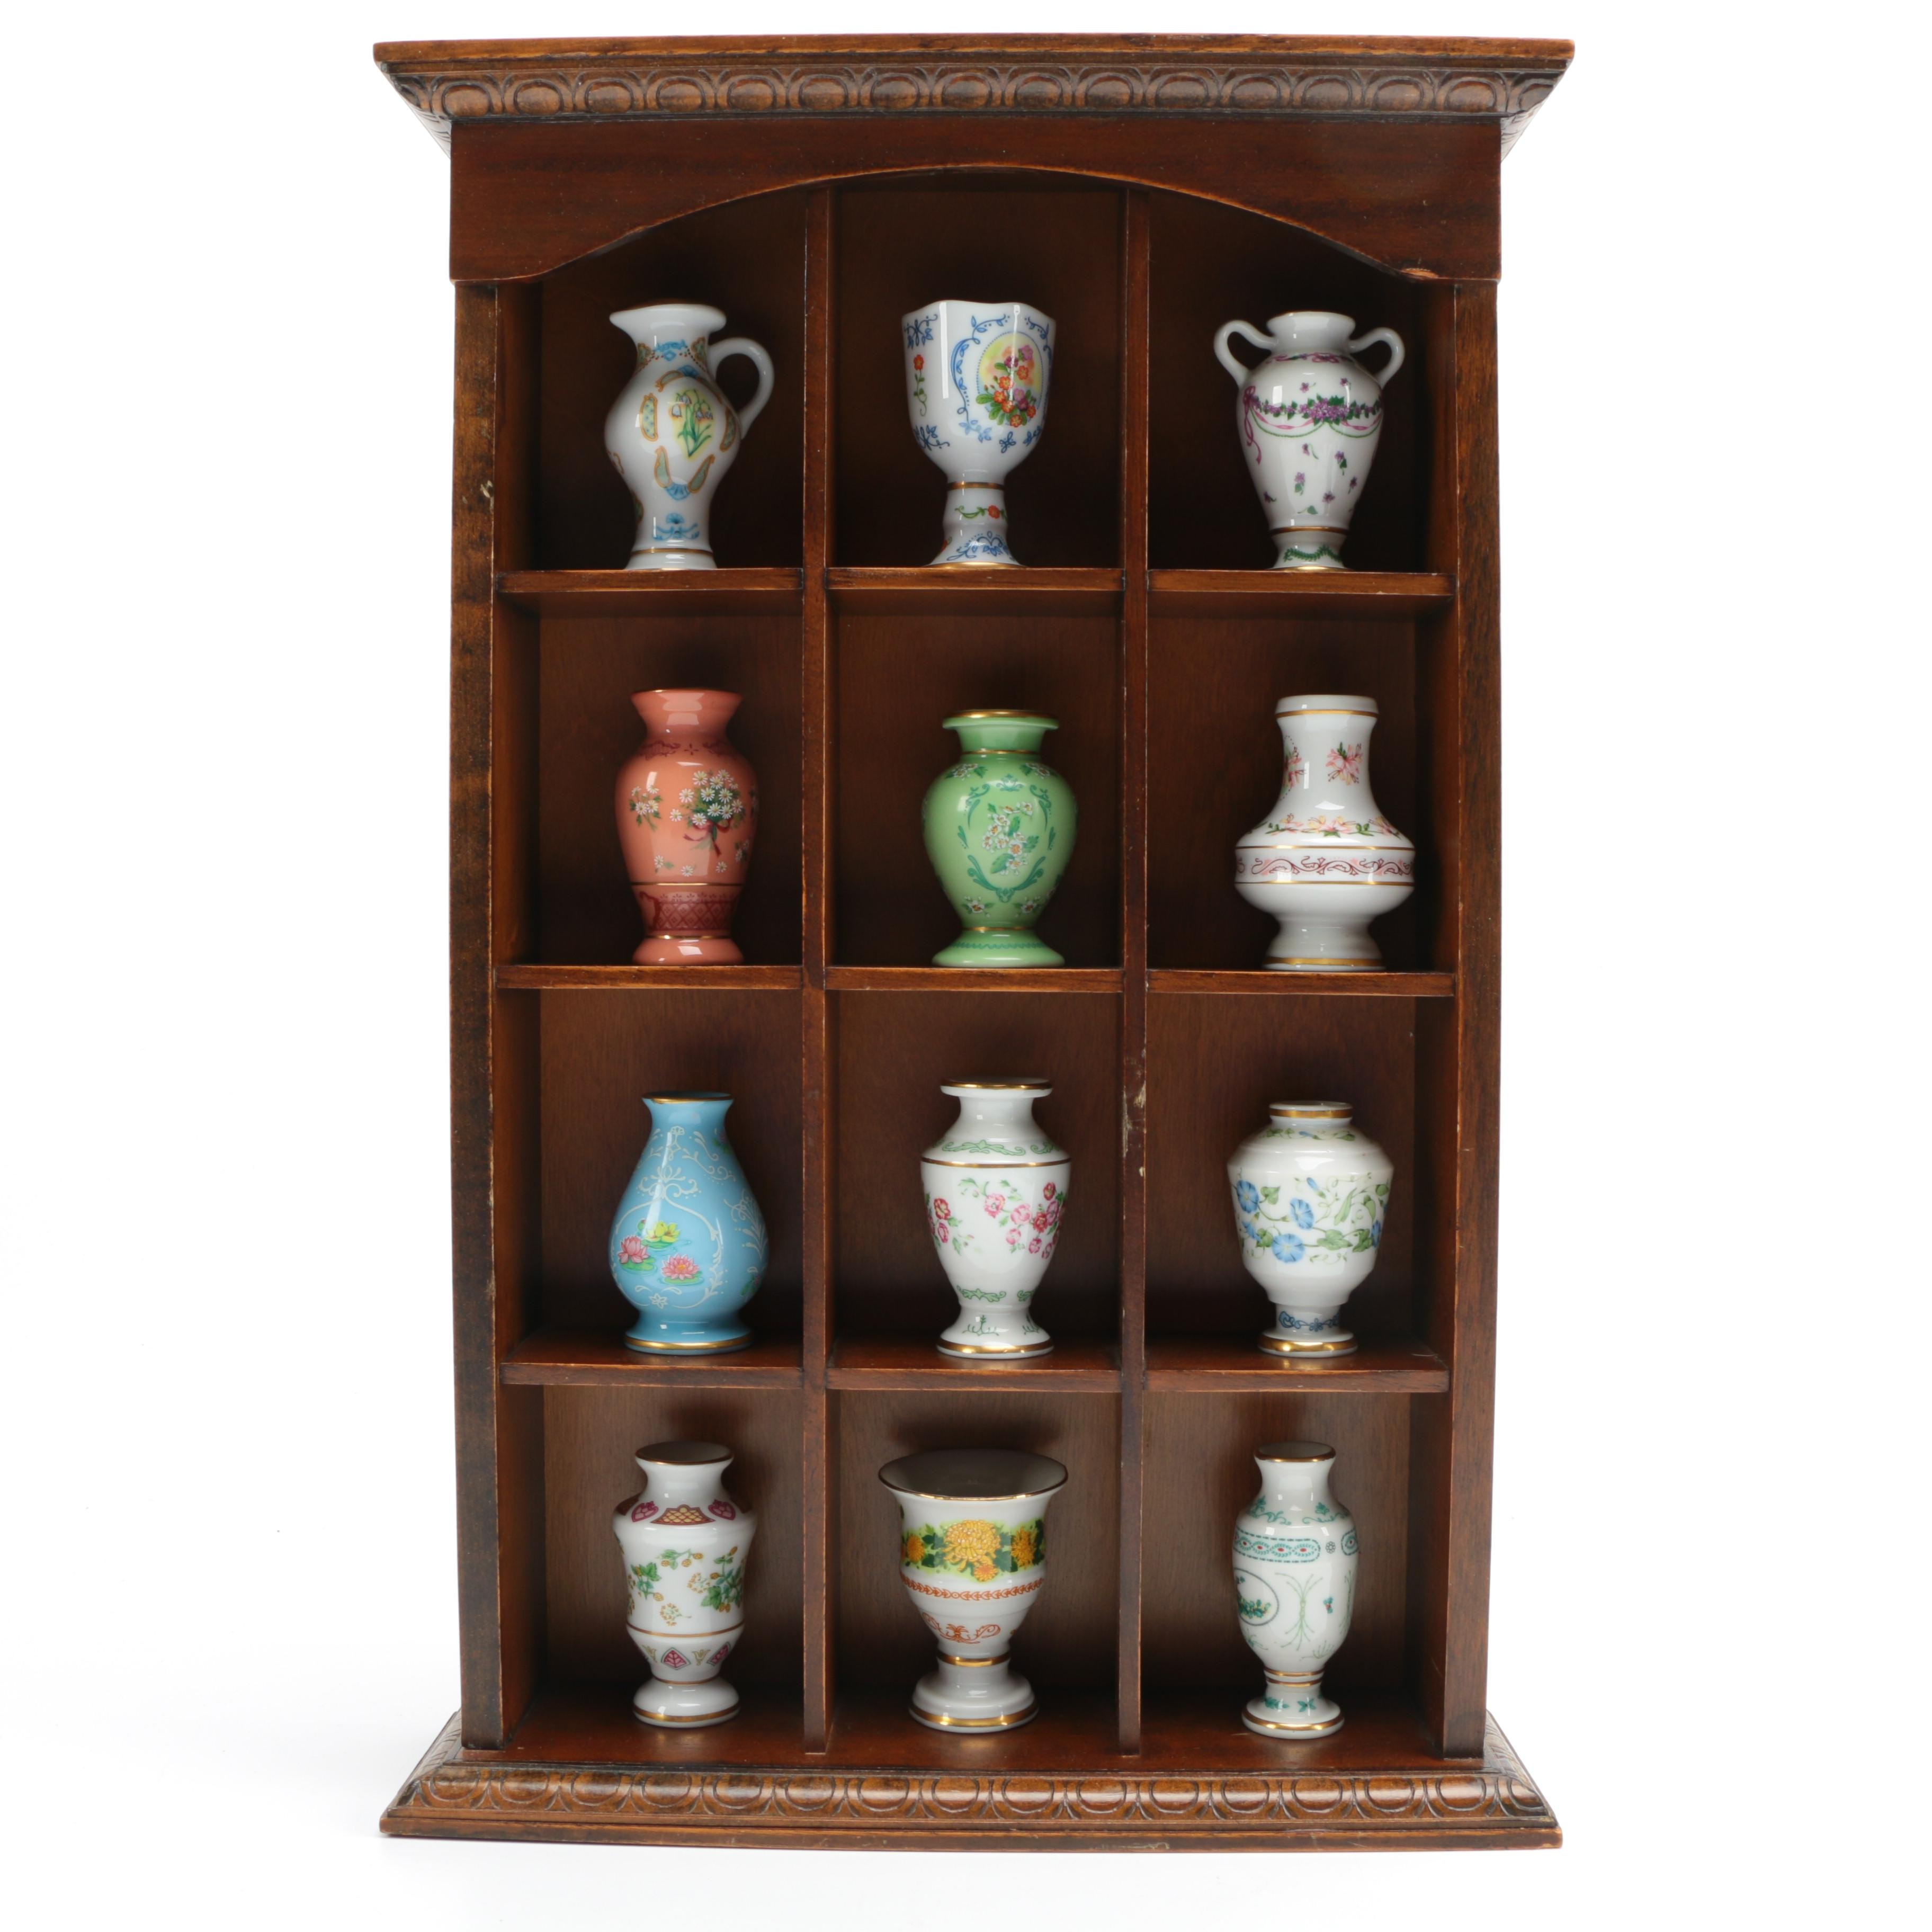 Collection of Twelve Japanese Porcelain Vases in Divided Display Shelf